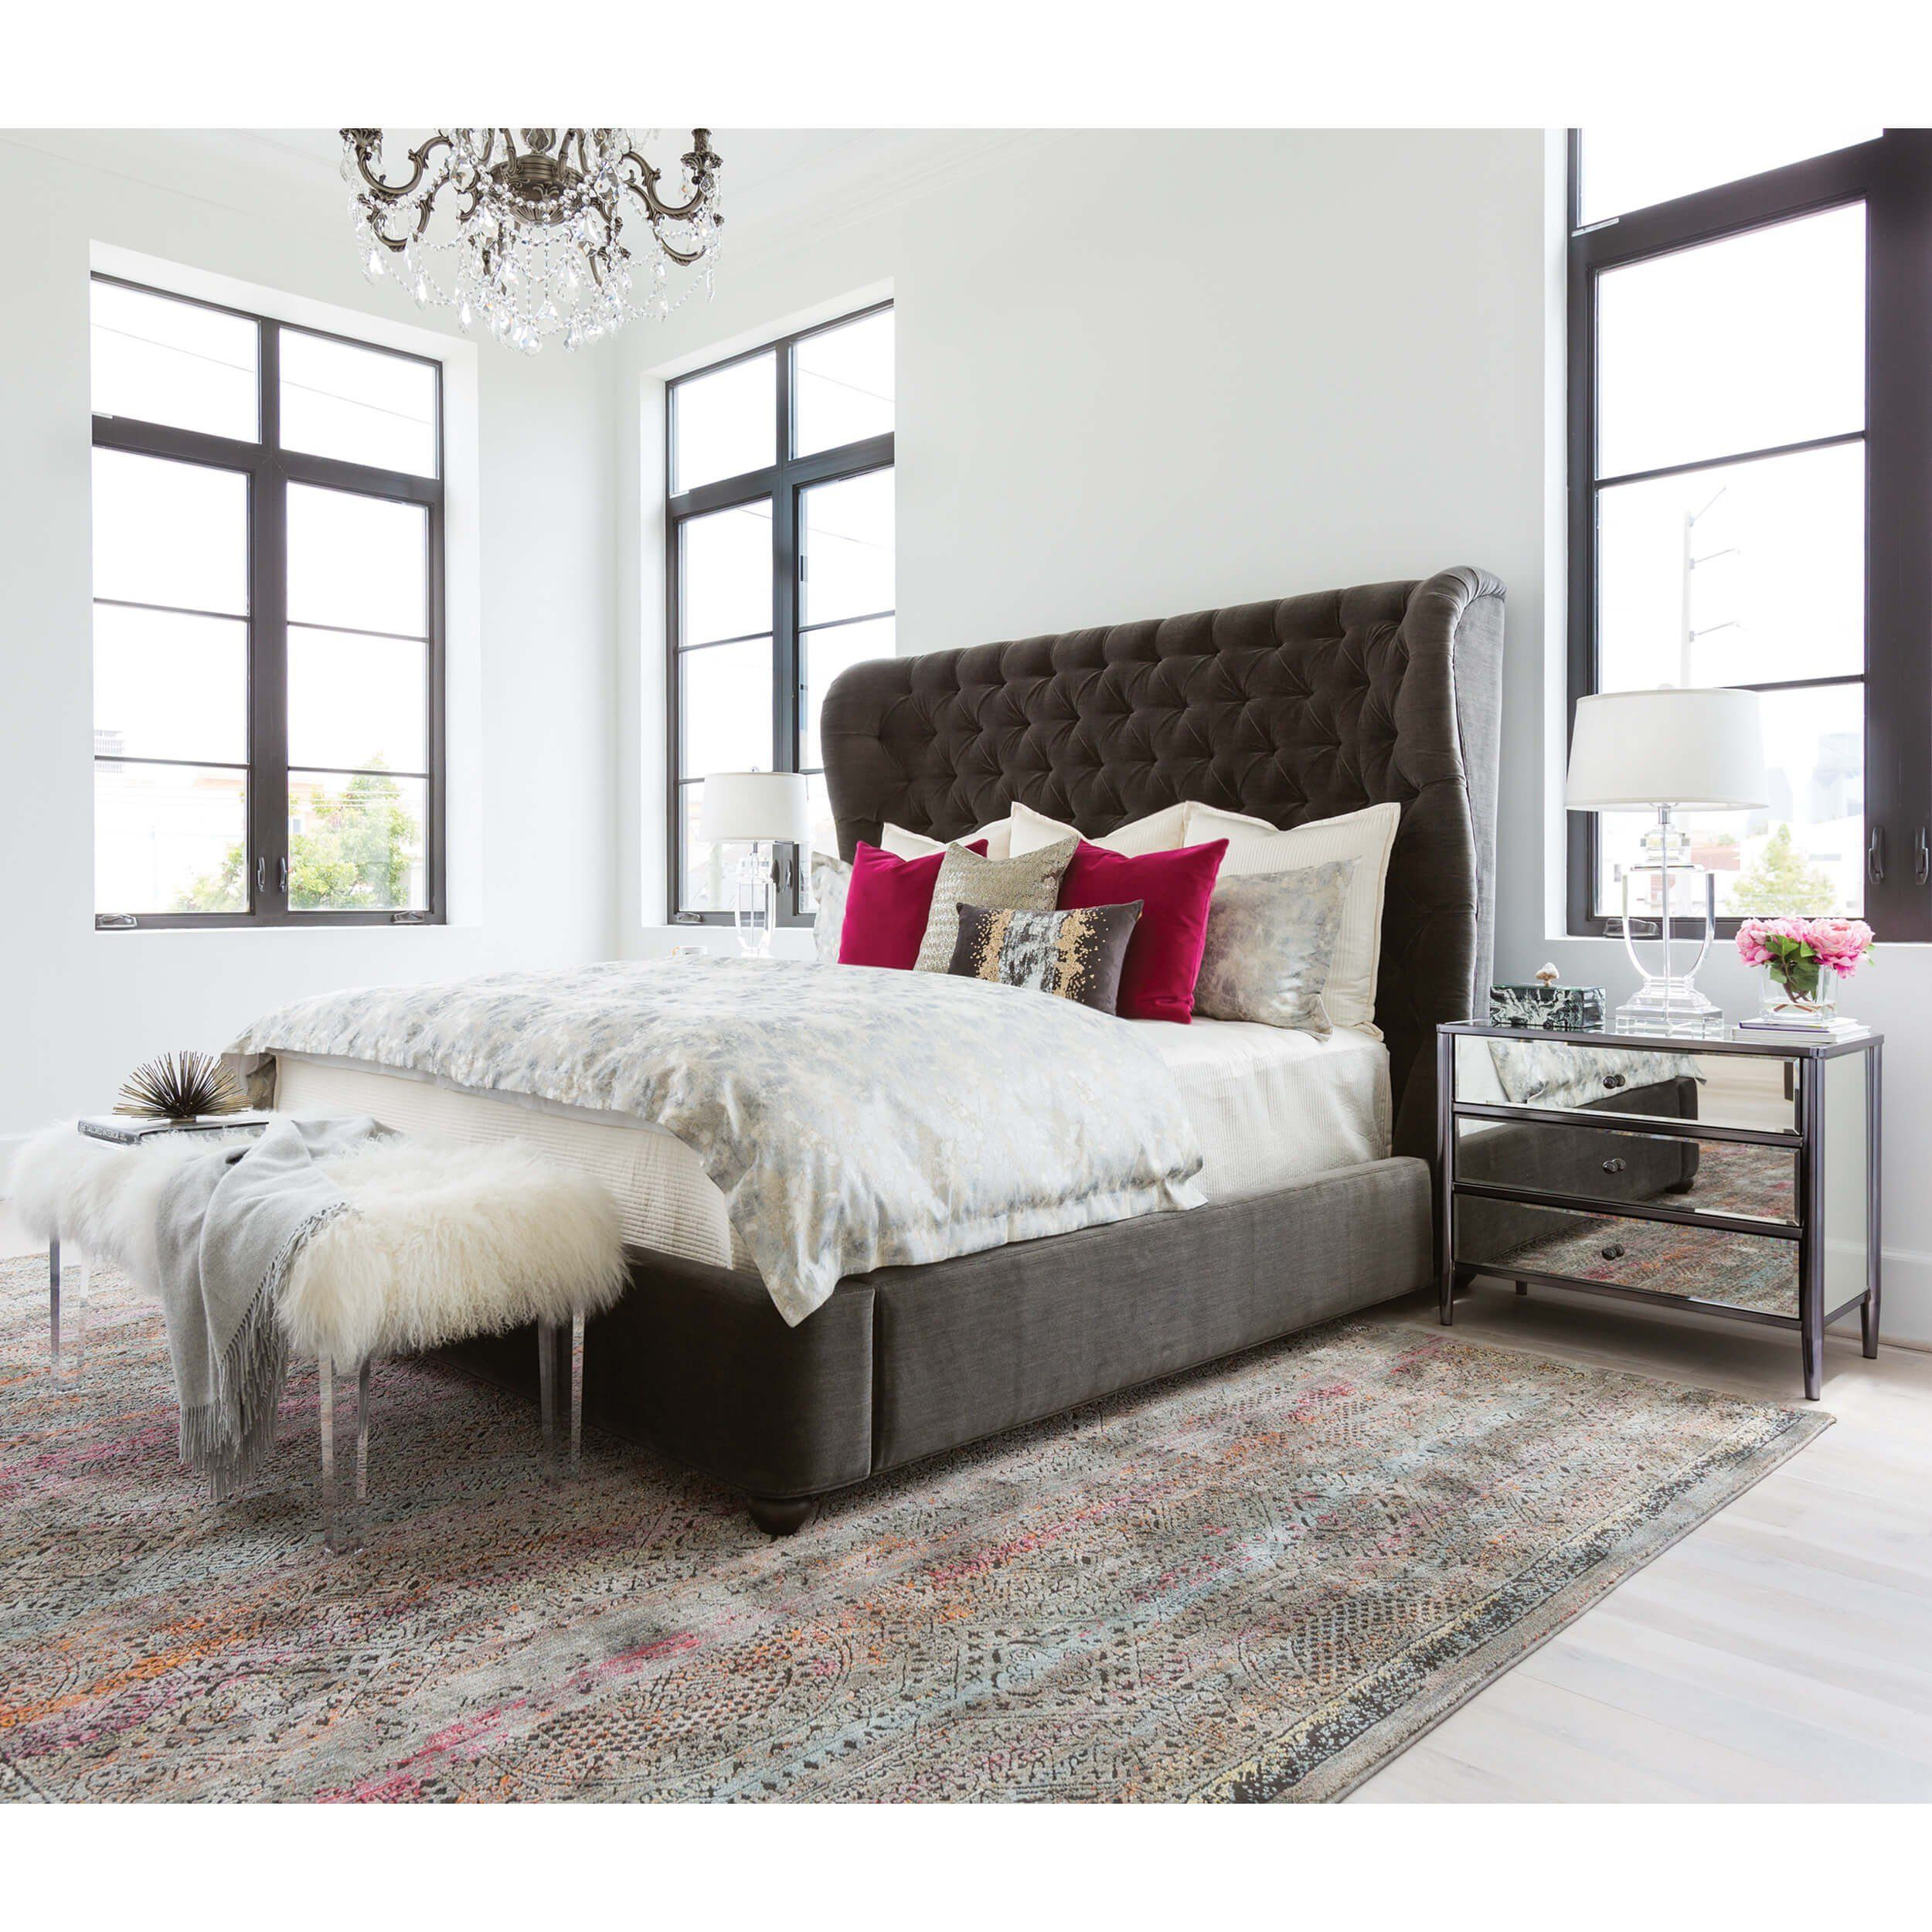 simone bed vernon flannel appartment ideas home decor bedroom rh pinterest com